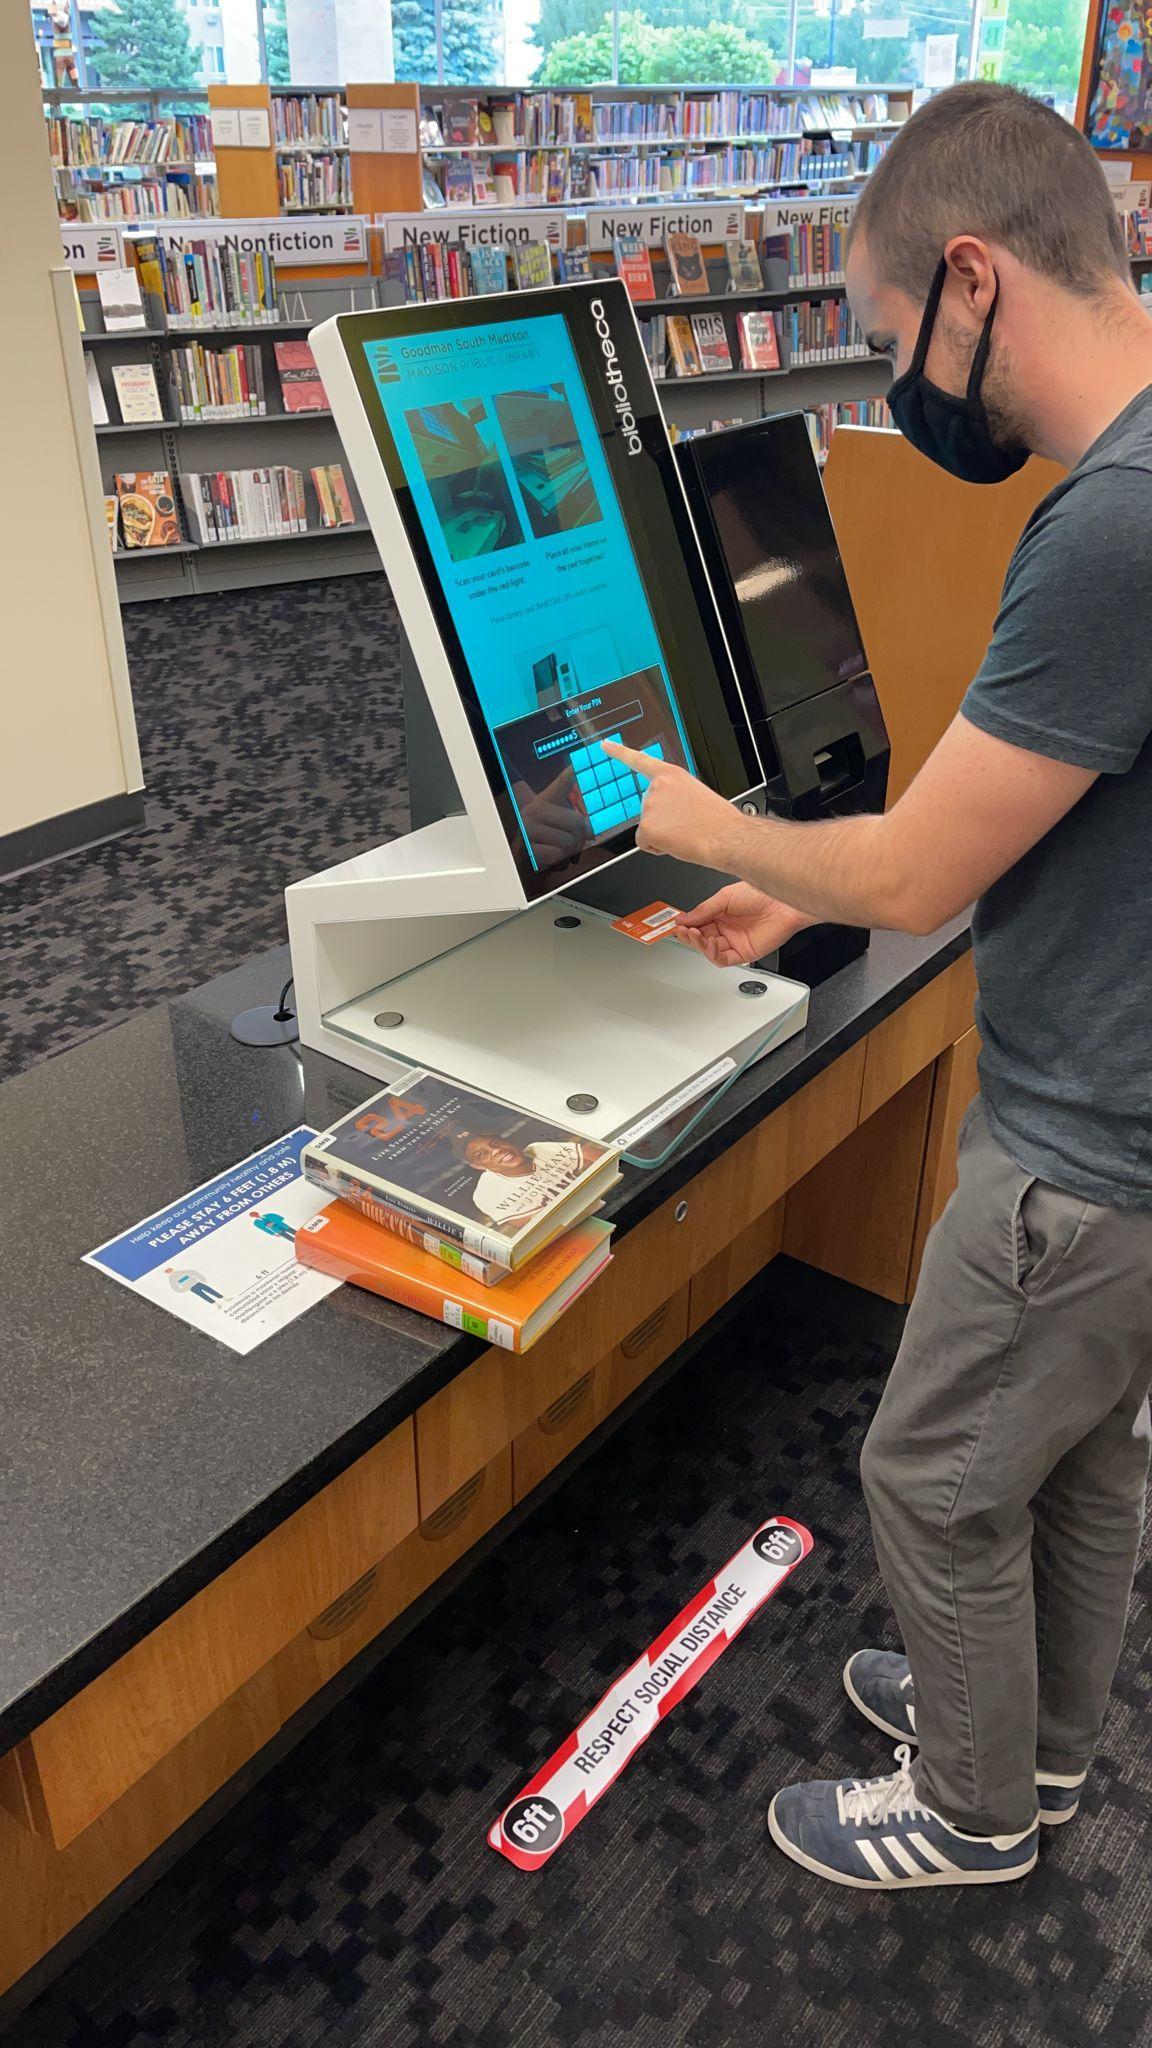 A patron checks out using a self-check machine at Goodman South Madison Library